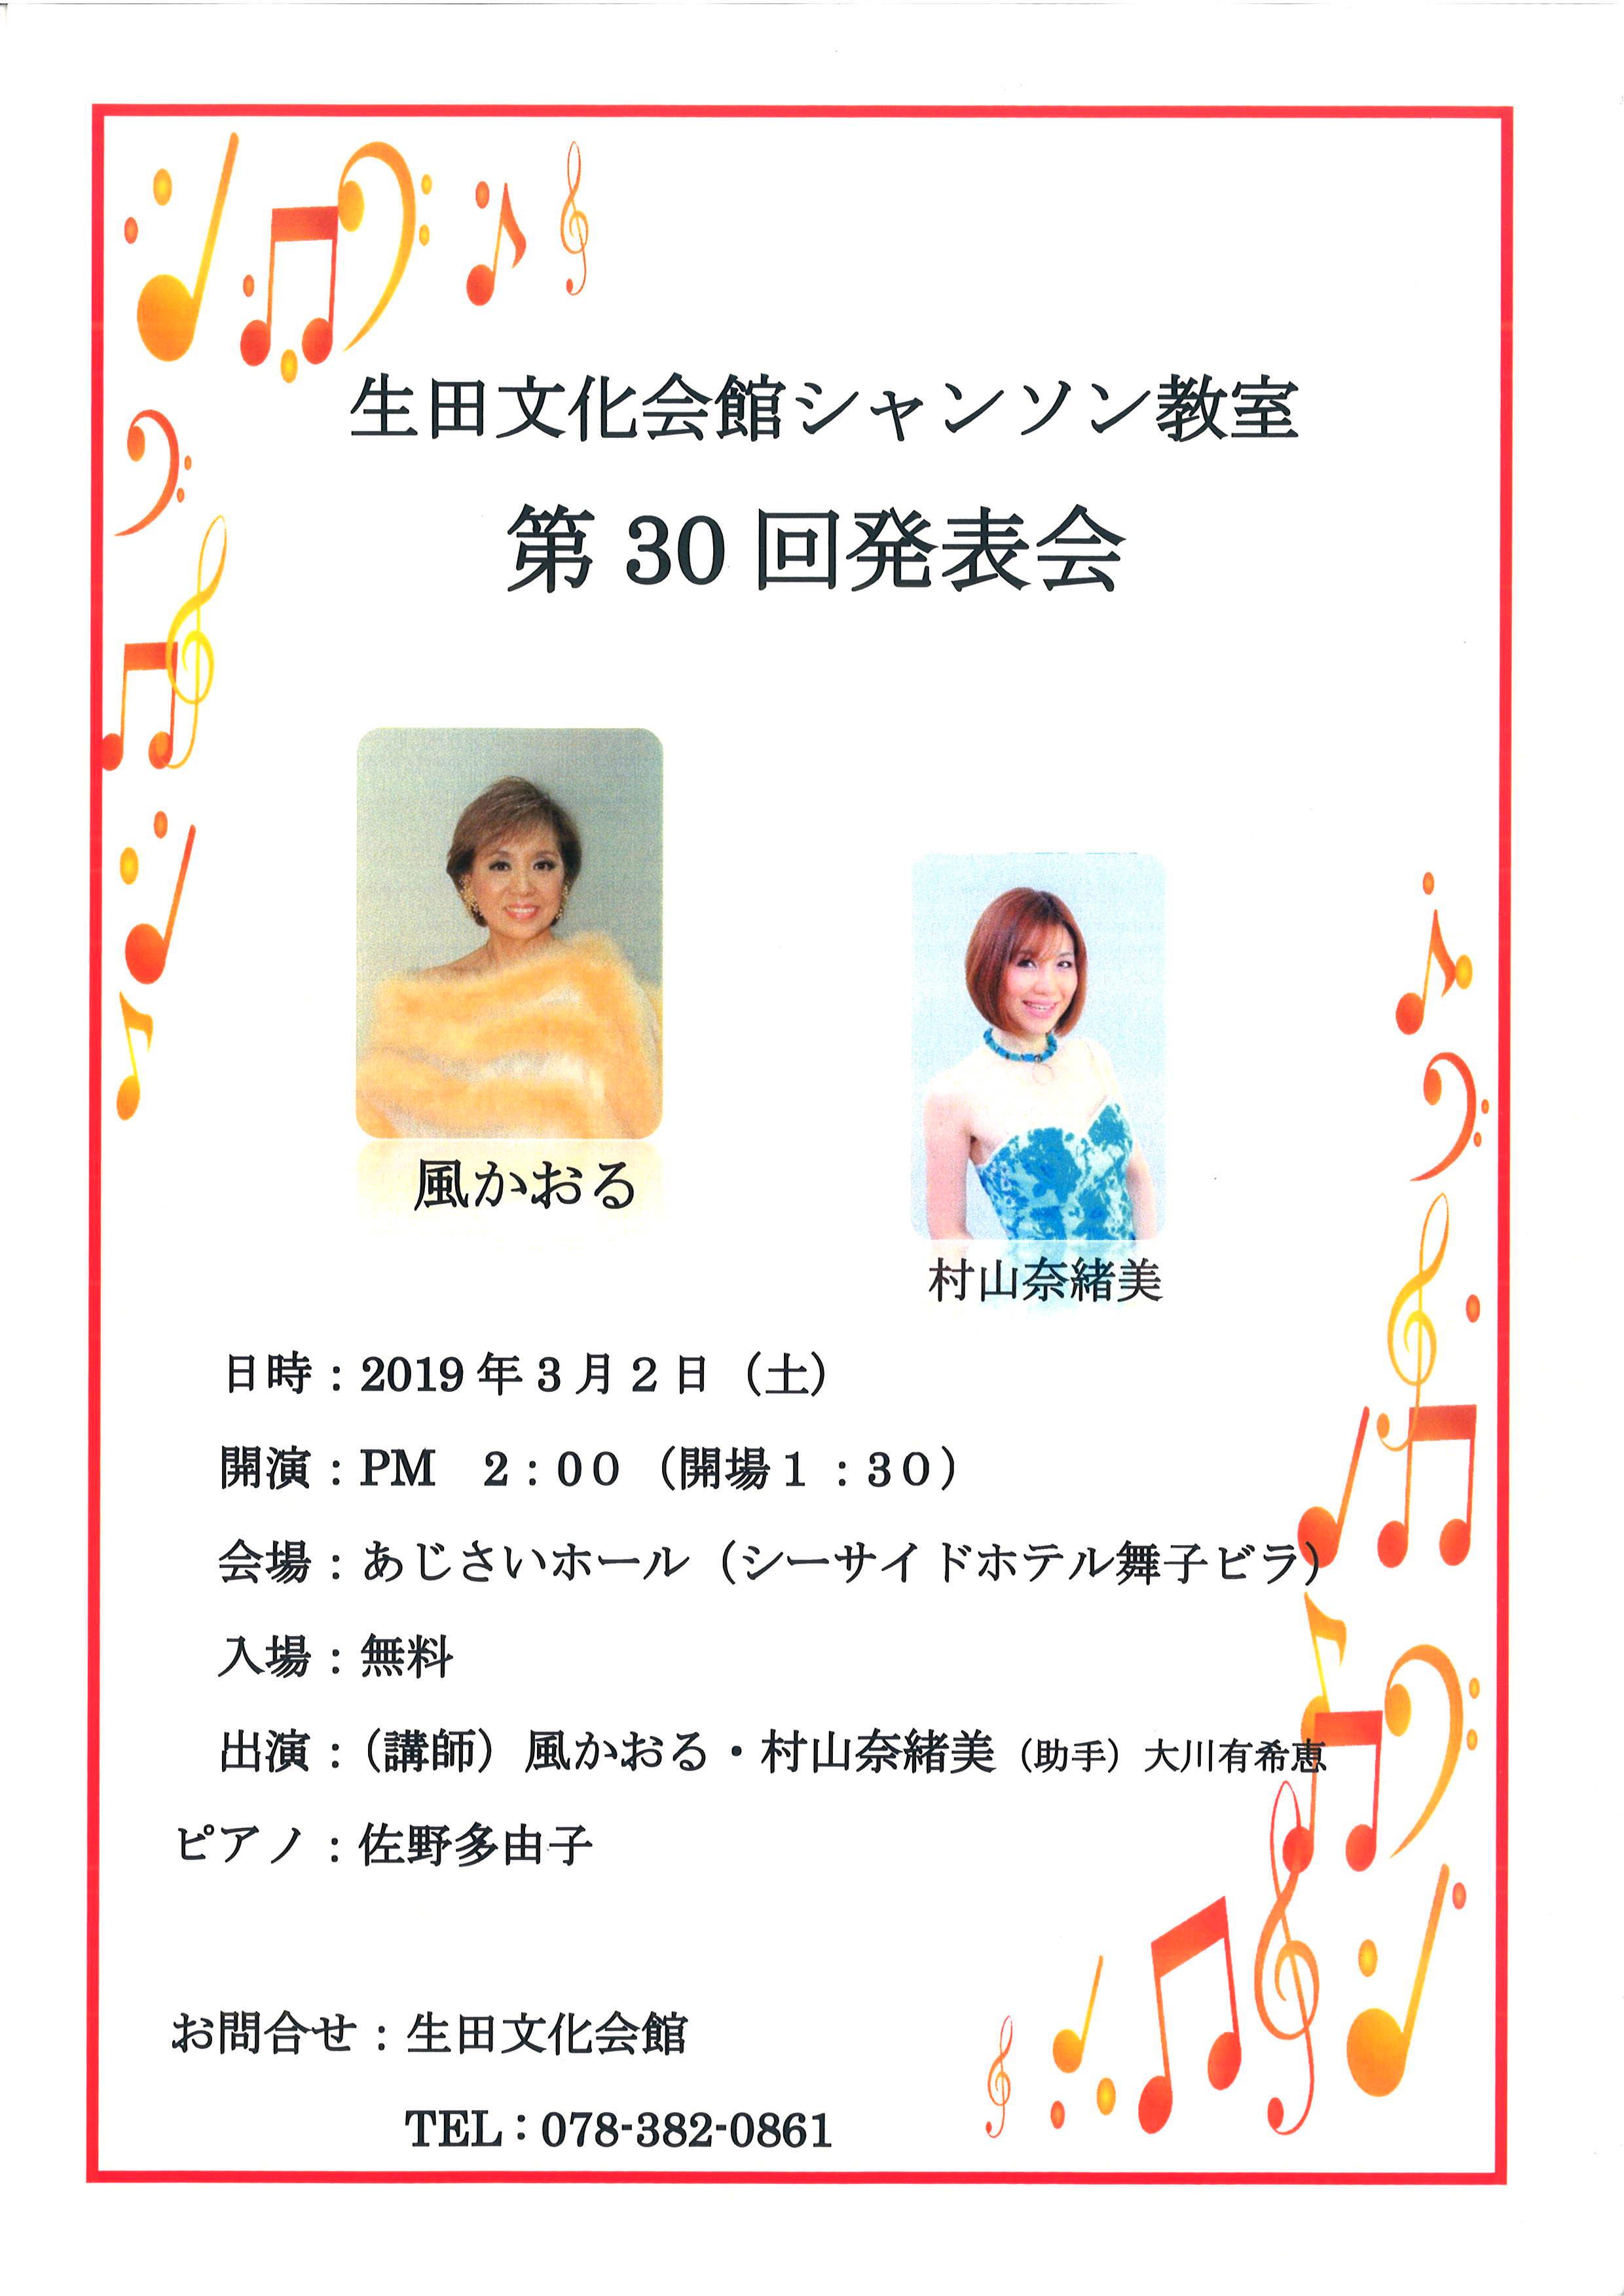 生田文化会館シャンソン教室 第30回発表会